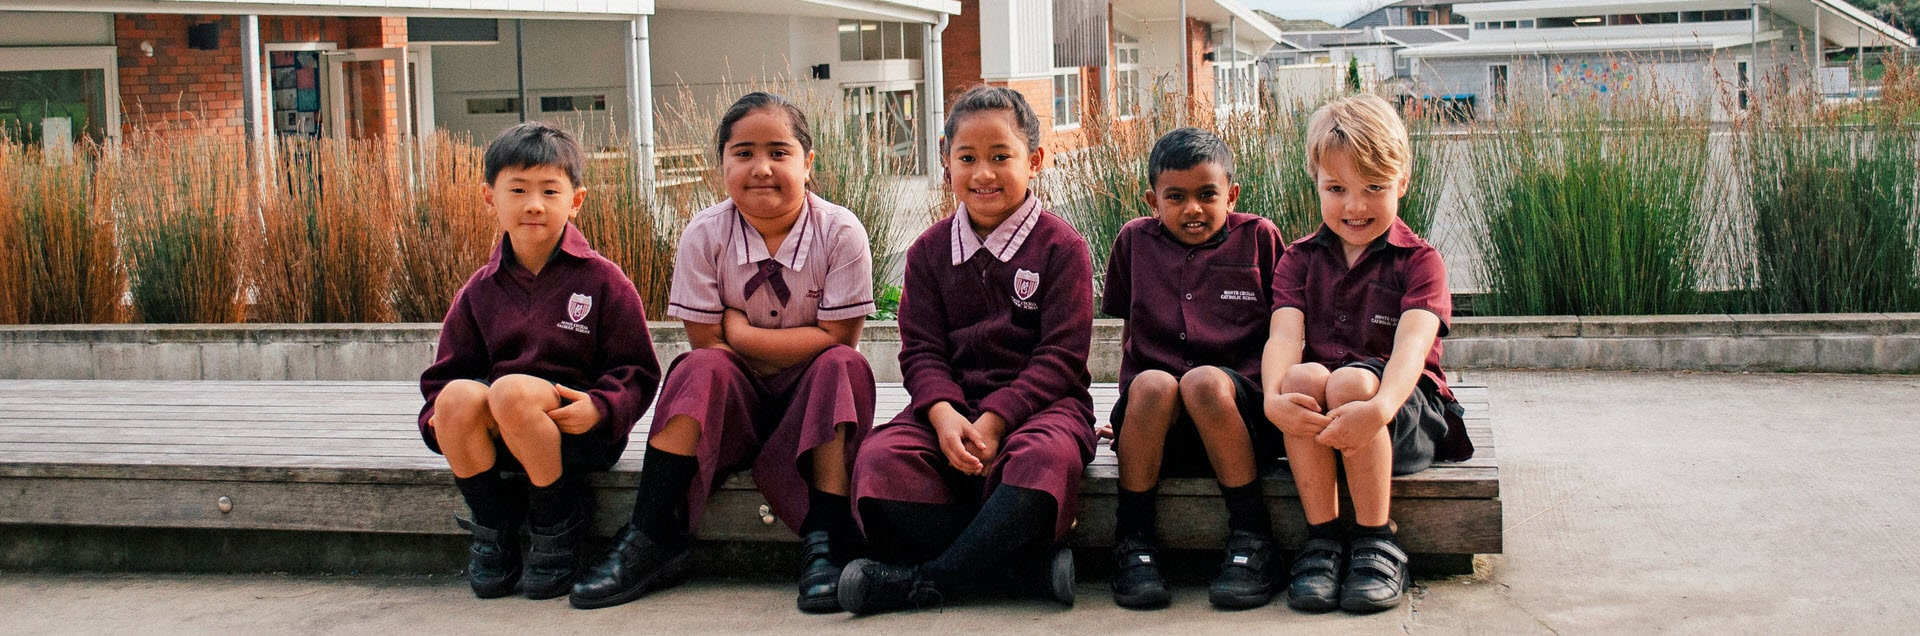 Catholic Primary School Hillsborough